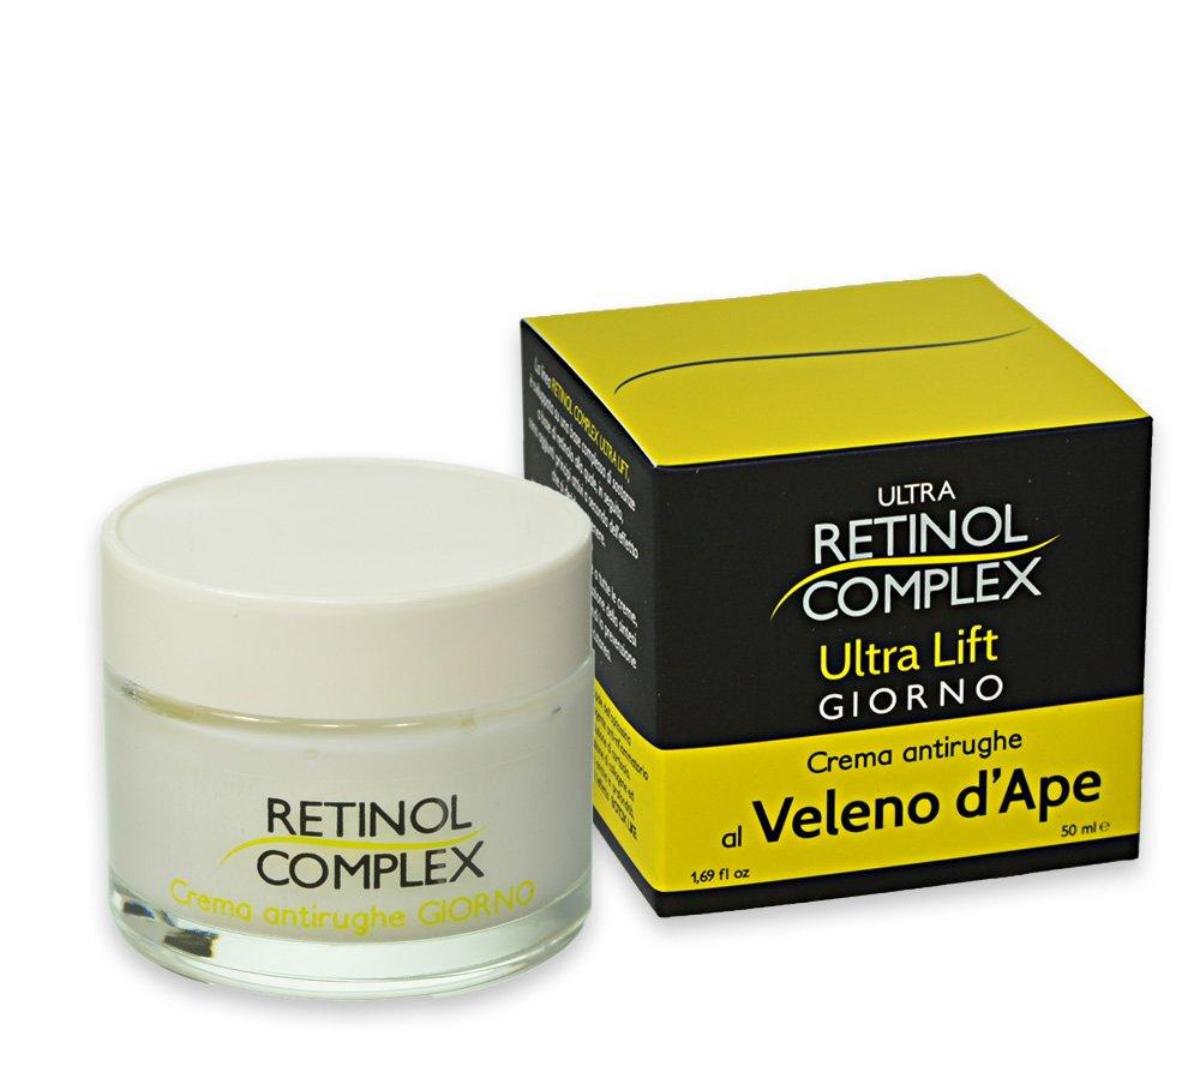 Crema Antirughe  Veleno d' Ape Retinol Complex